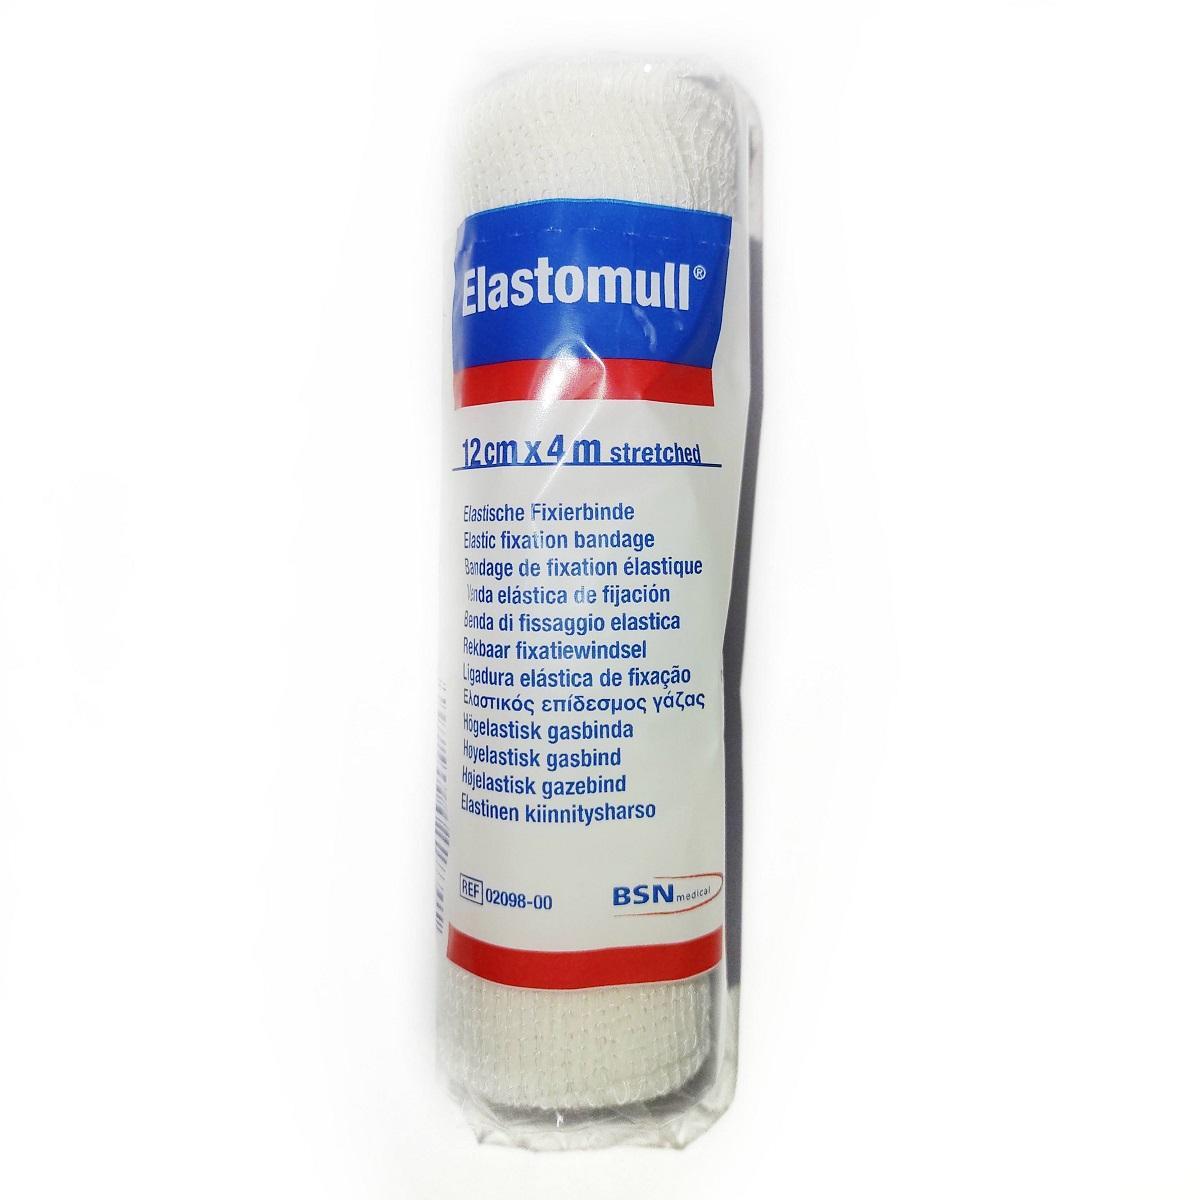 Elastomull 12 cms x 4 mts